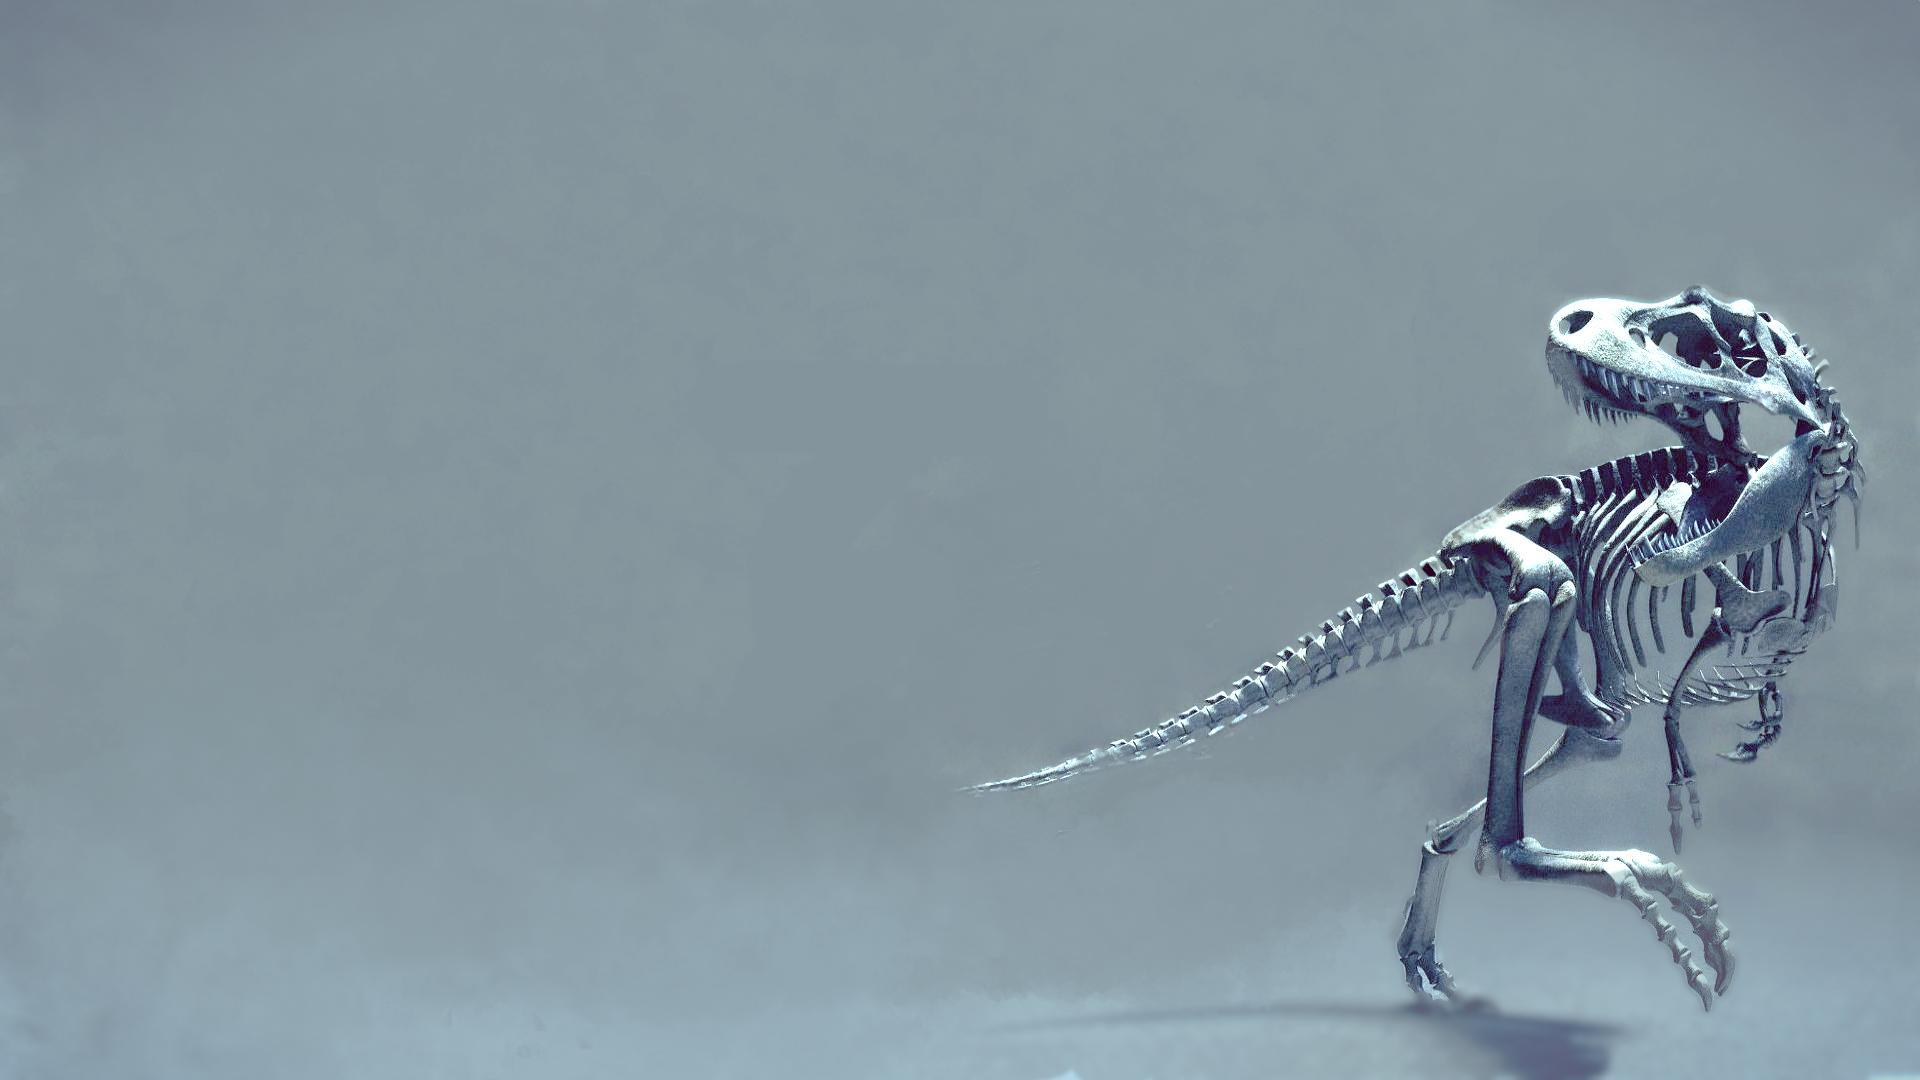 dinosaur hd wallpaper free download